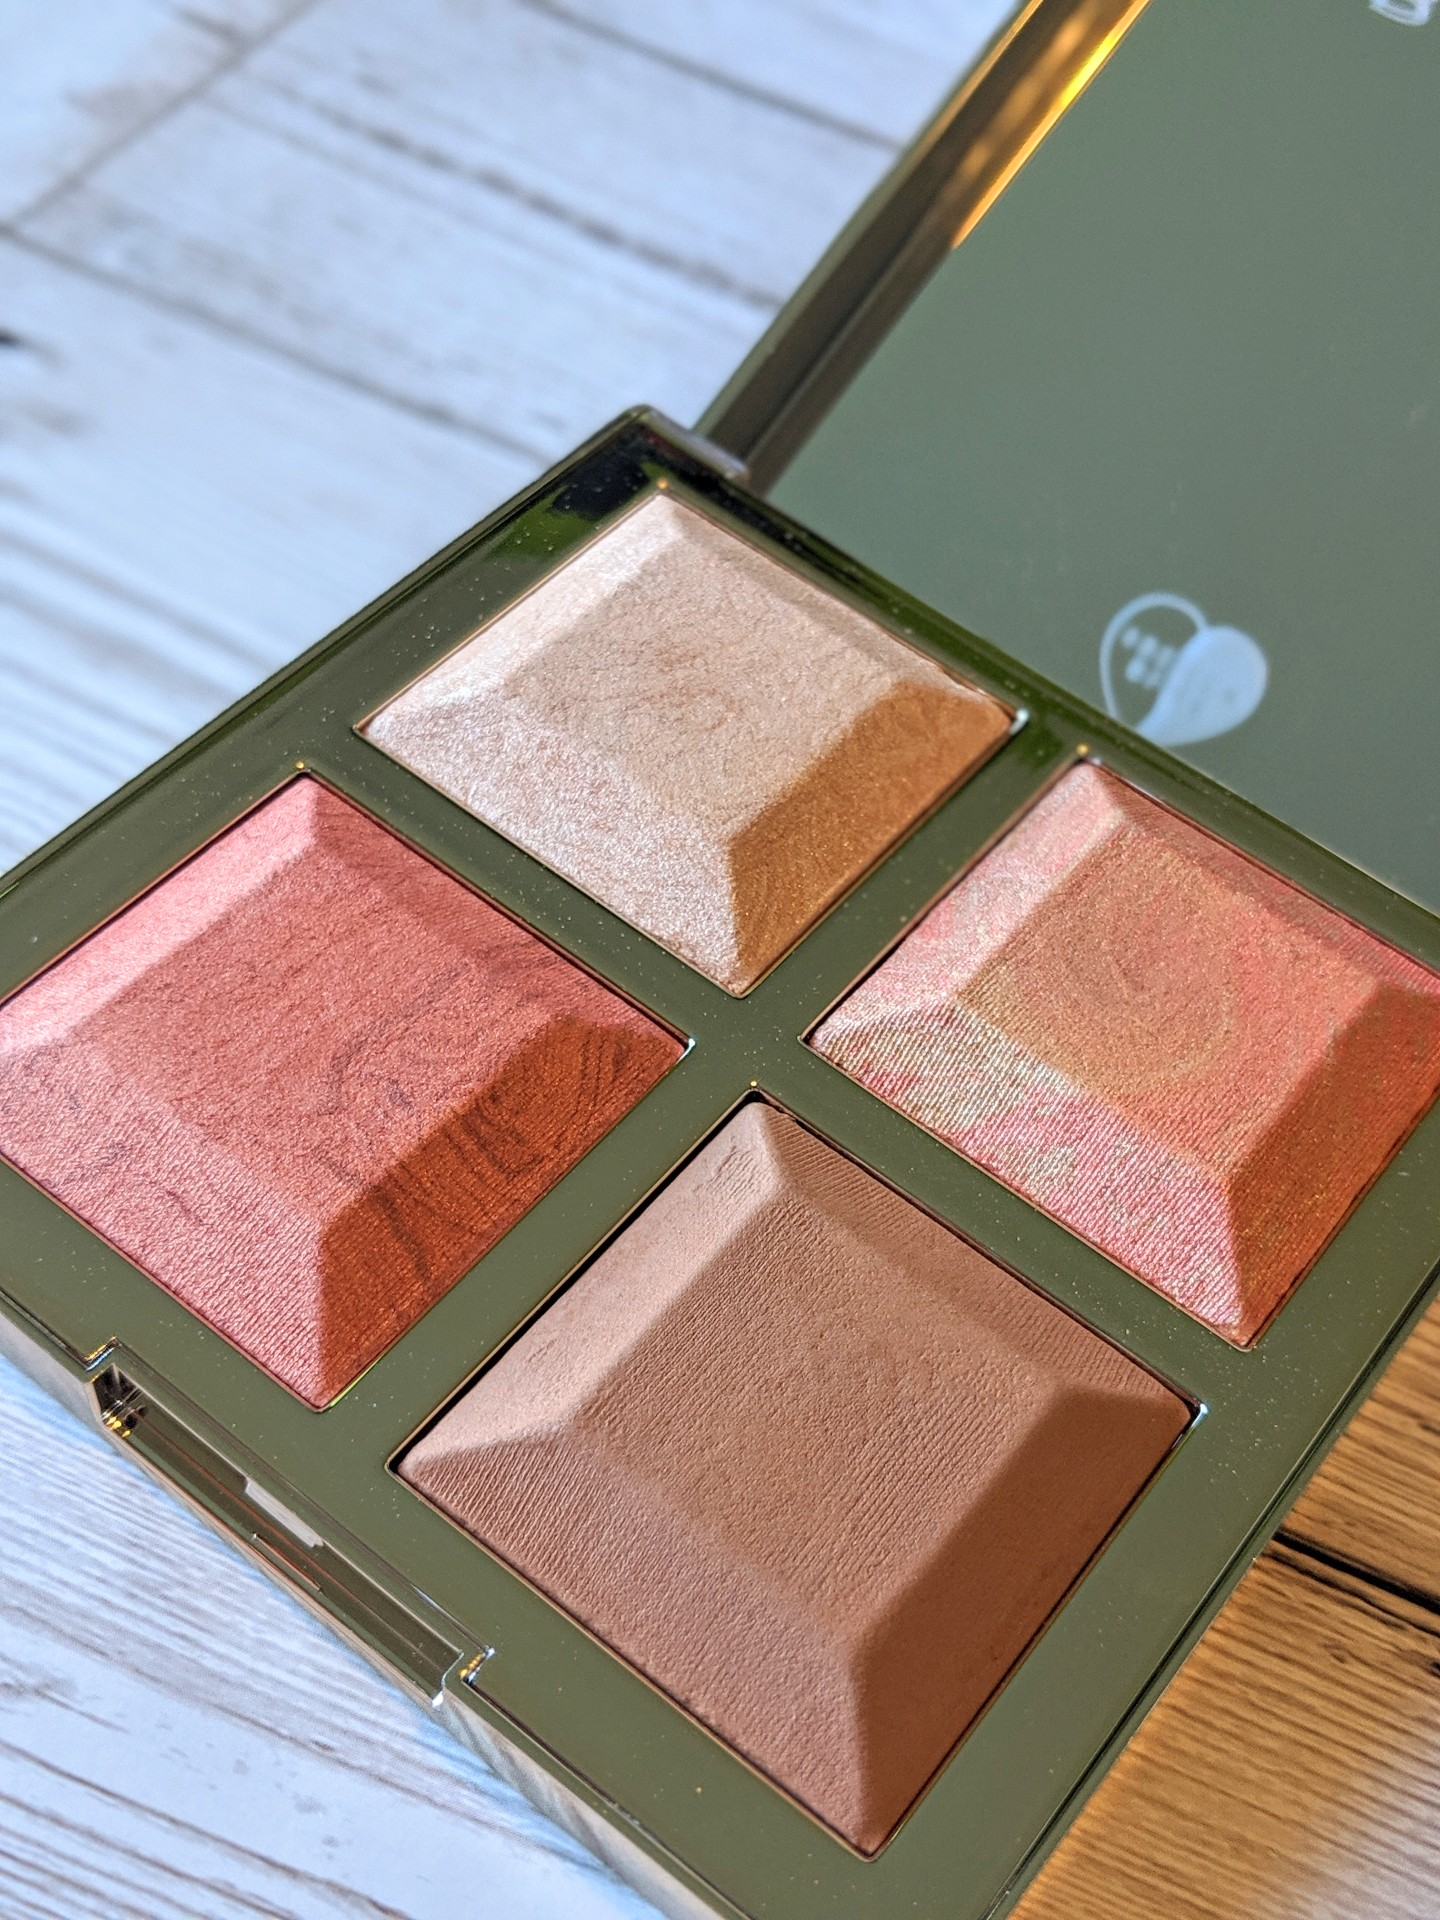 Becca x Khloe Kardashian & Malika Haqq Bronze, Blush and Glow Palette